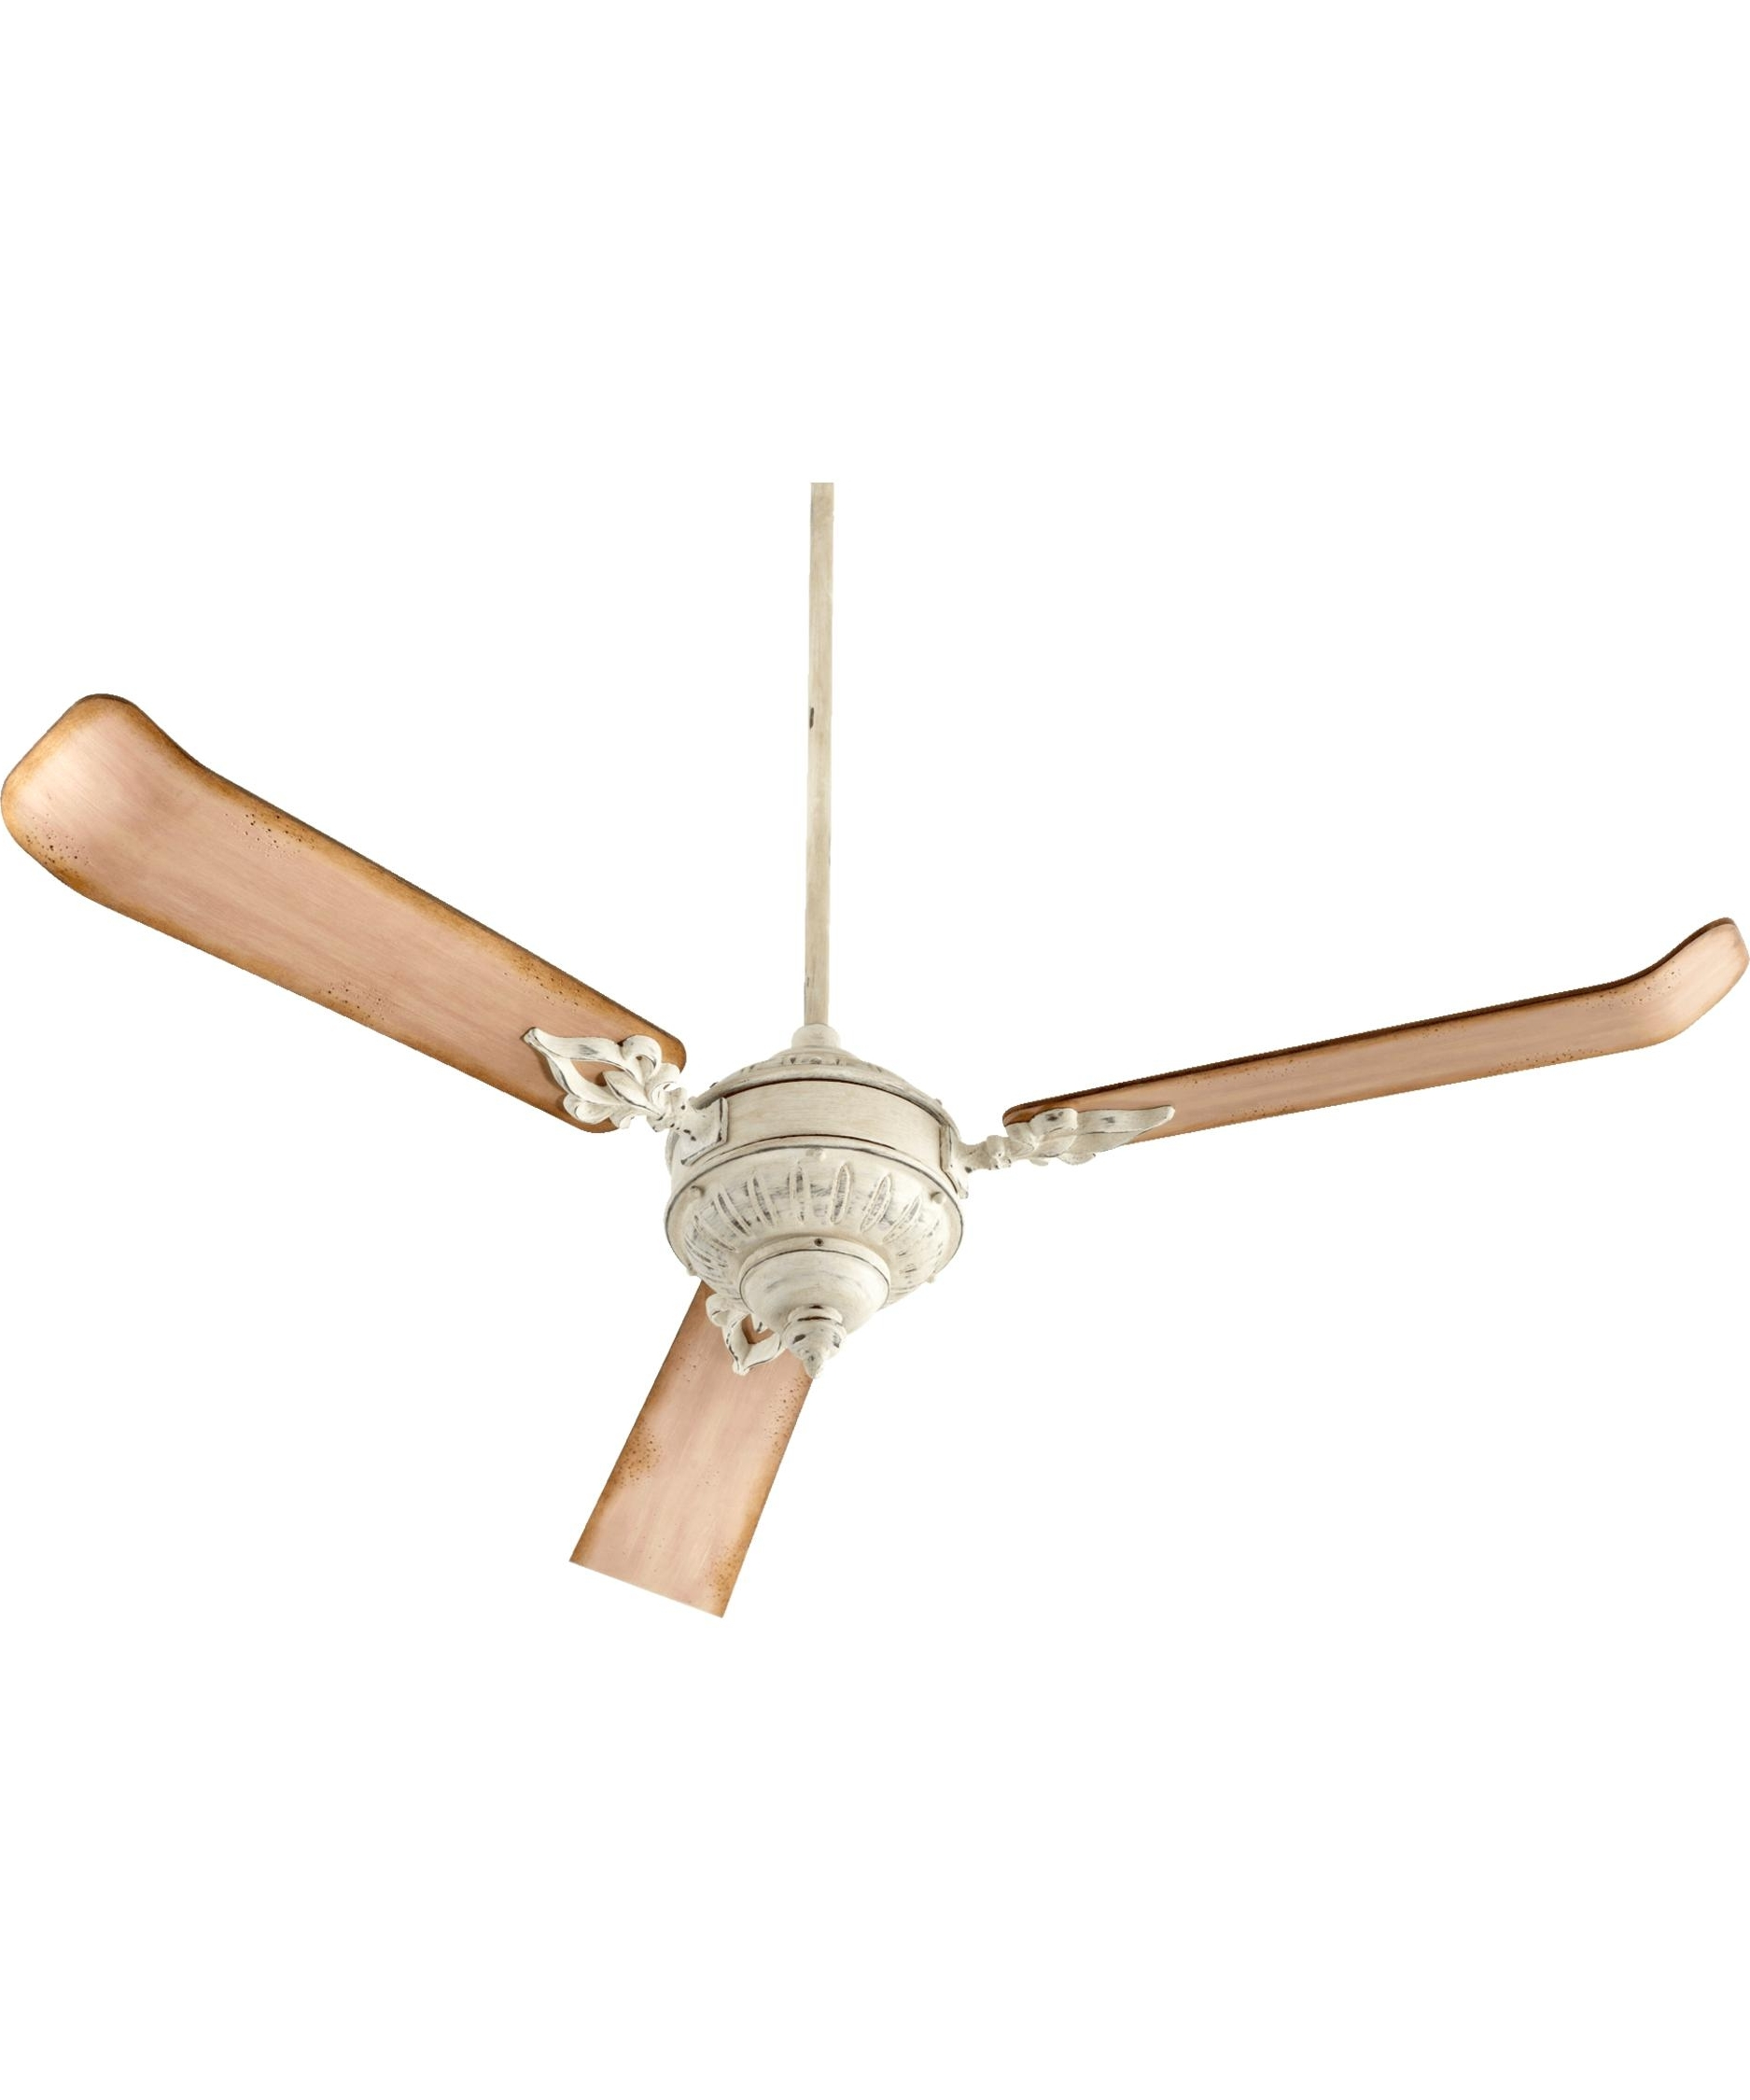 Fashionable Quorum International 27603 Brewster 60 Inch 3 Blade Ceiling Fan Regarding Quorum Outdoor Ceiling Fans (View 2 of 20)